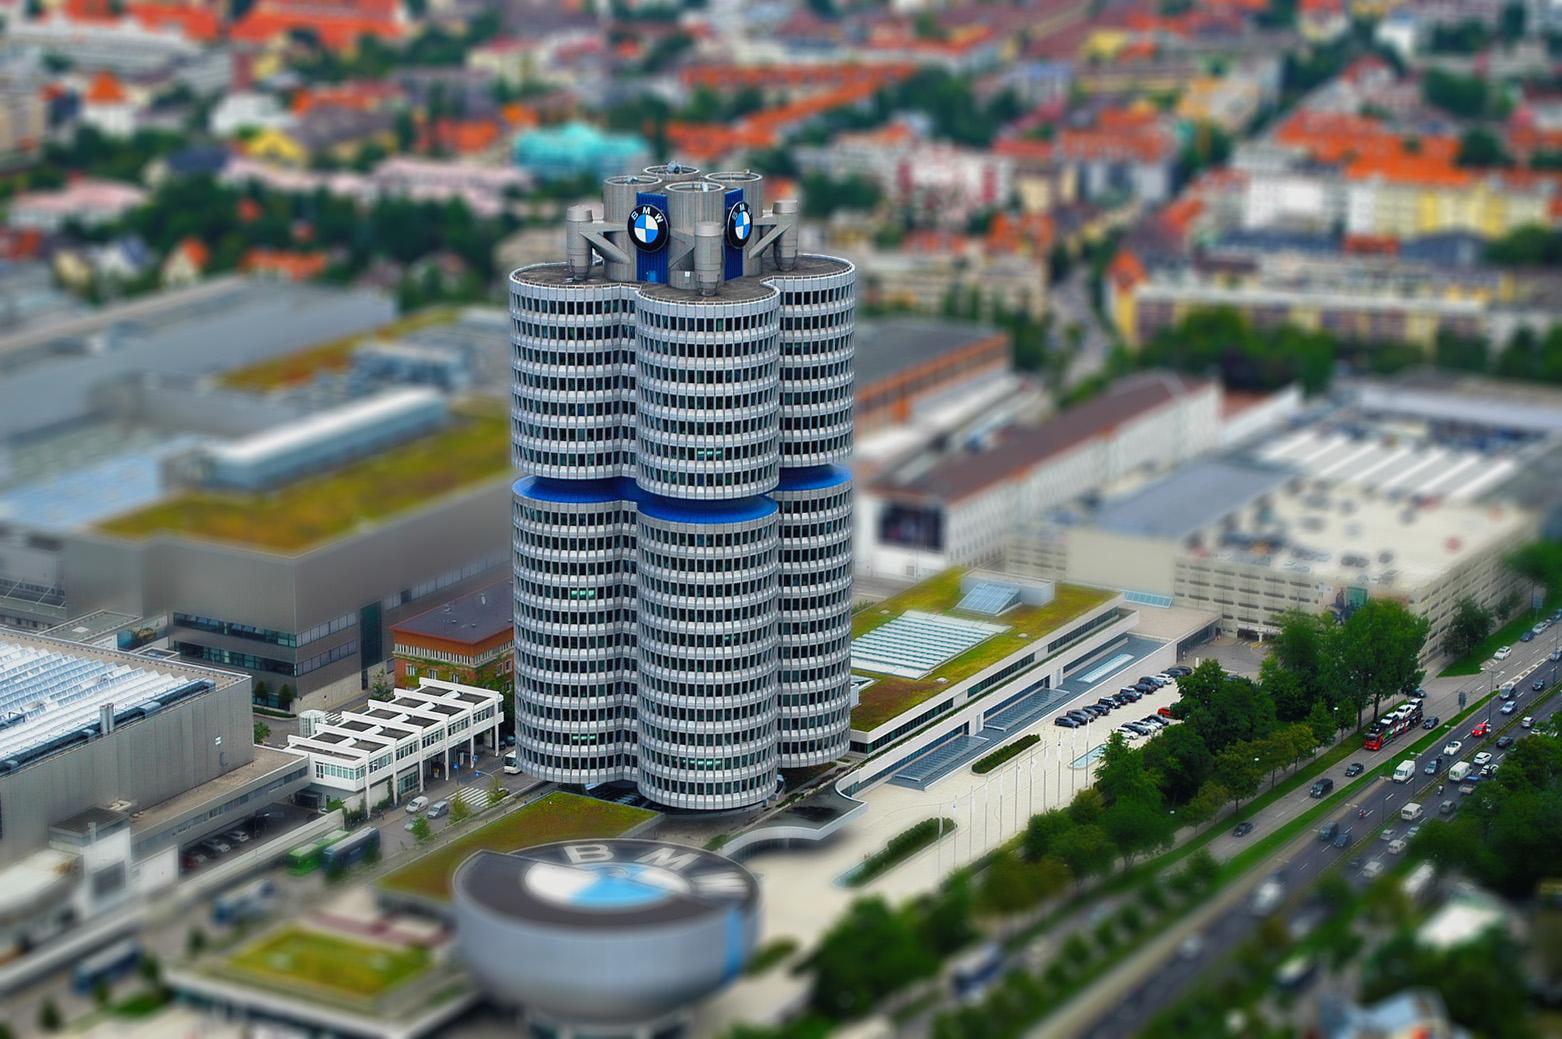 Tiny BMW Headquarters